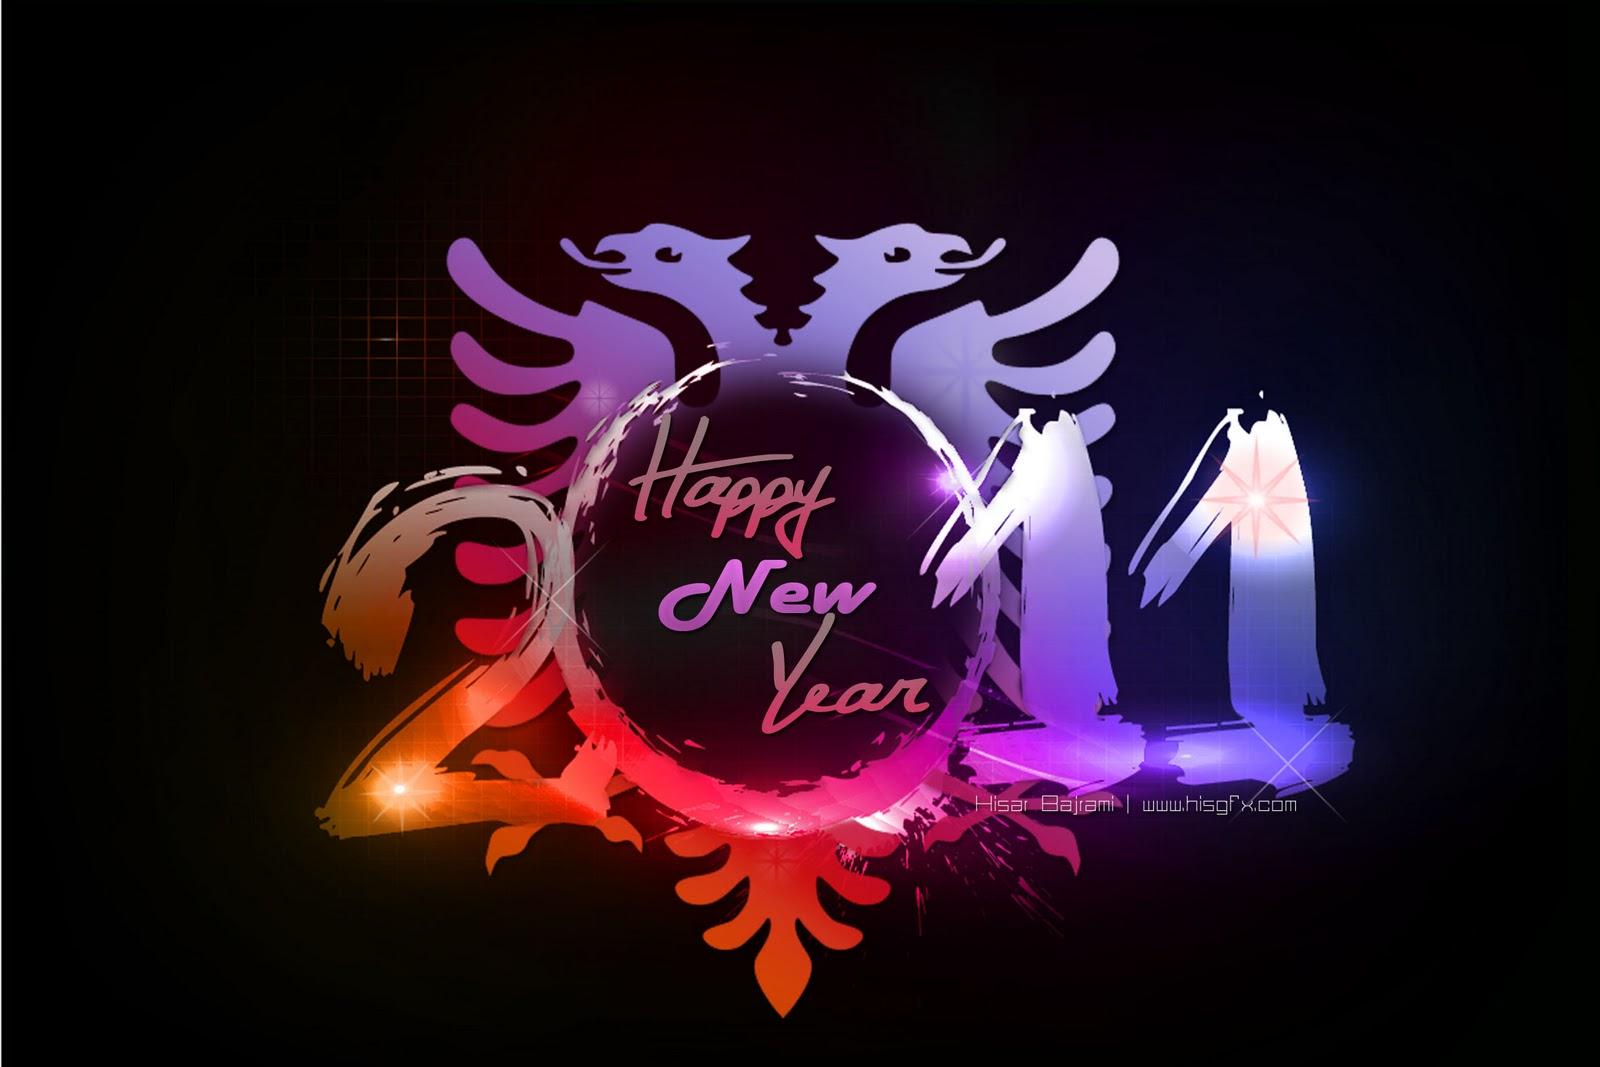 http://4.bp.blogspot.com/_Ain1HbvlMRk/TRT2z5suRDI/AAAAAAAAHgY/tpqVZ0jercM/s1600/happy_new_year_2011_by_tetova21-d35ittn.jpg